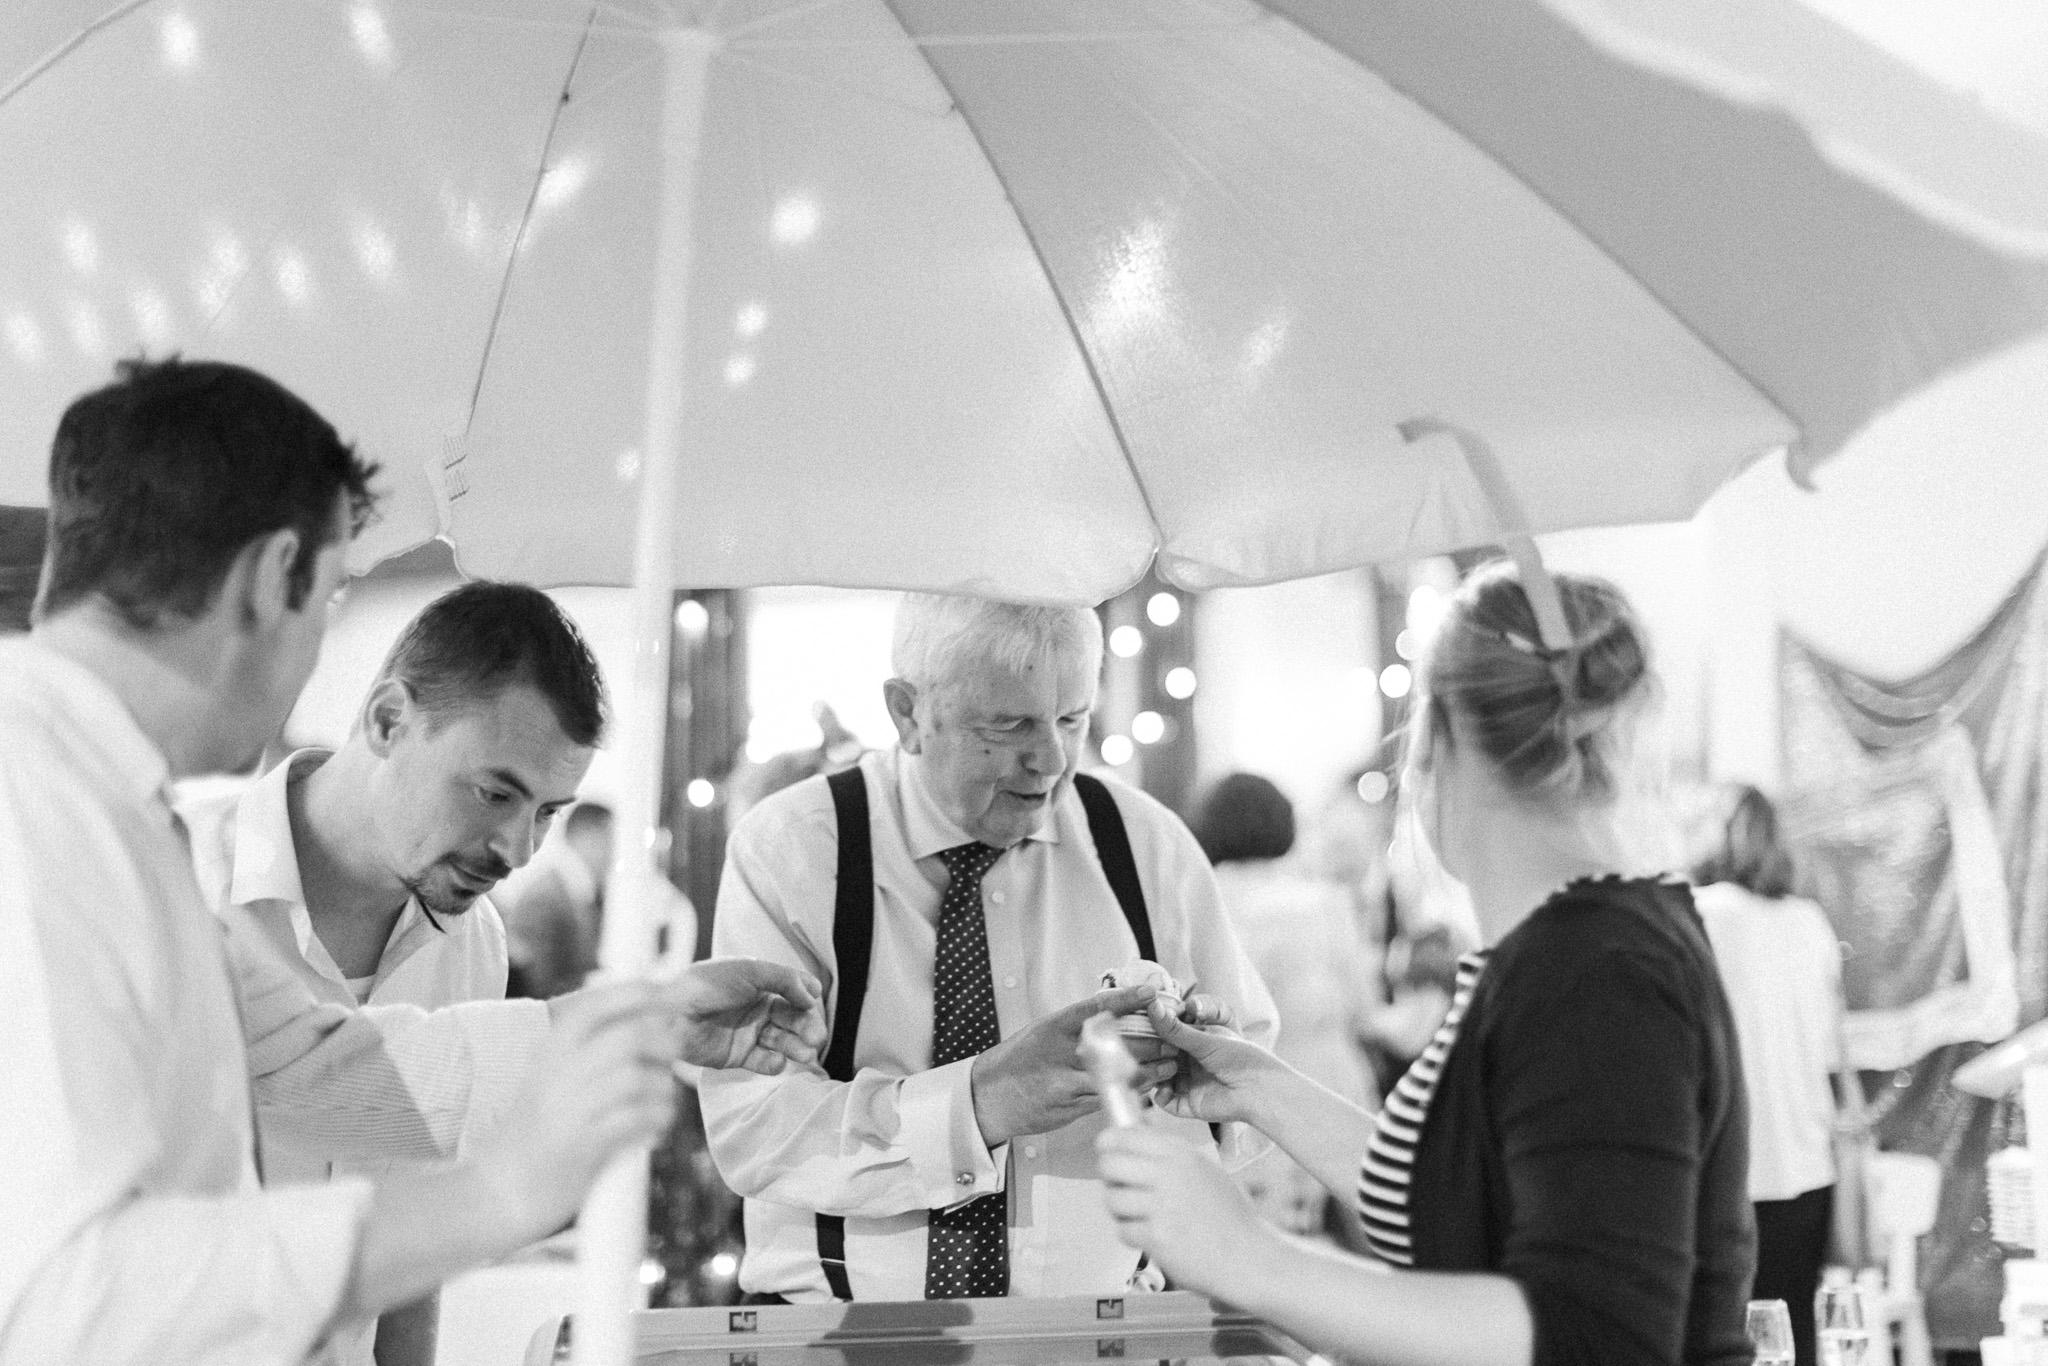 st_andrews_fabrica_brighton_wedding_620.jpg